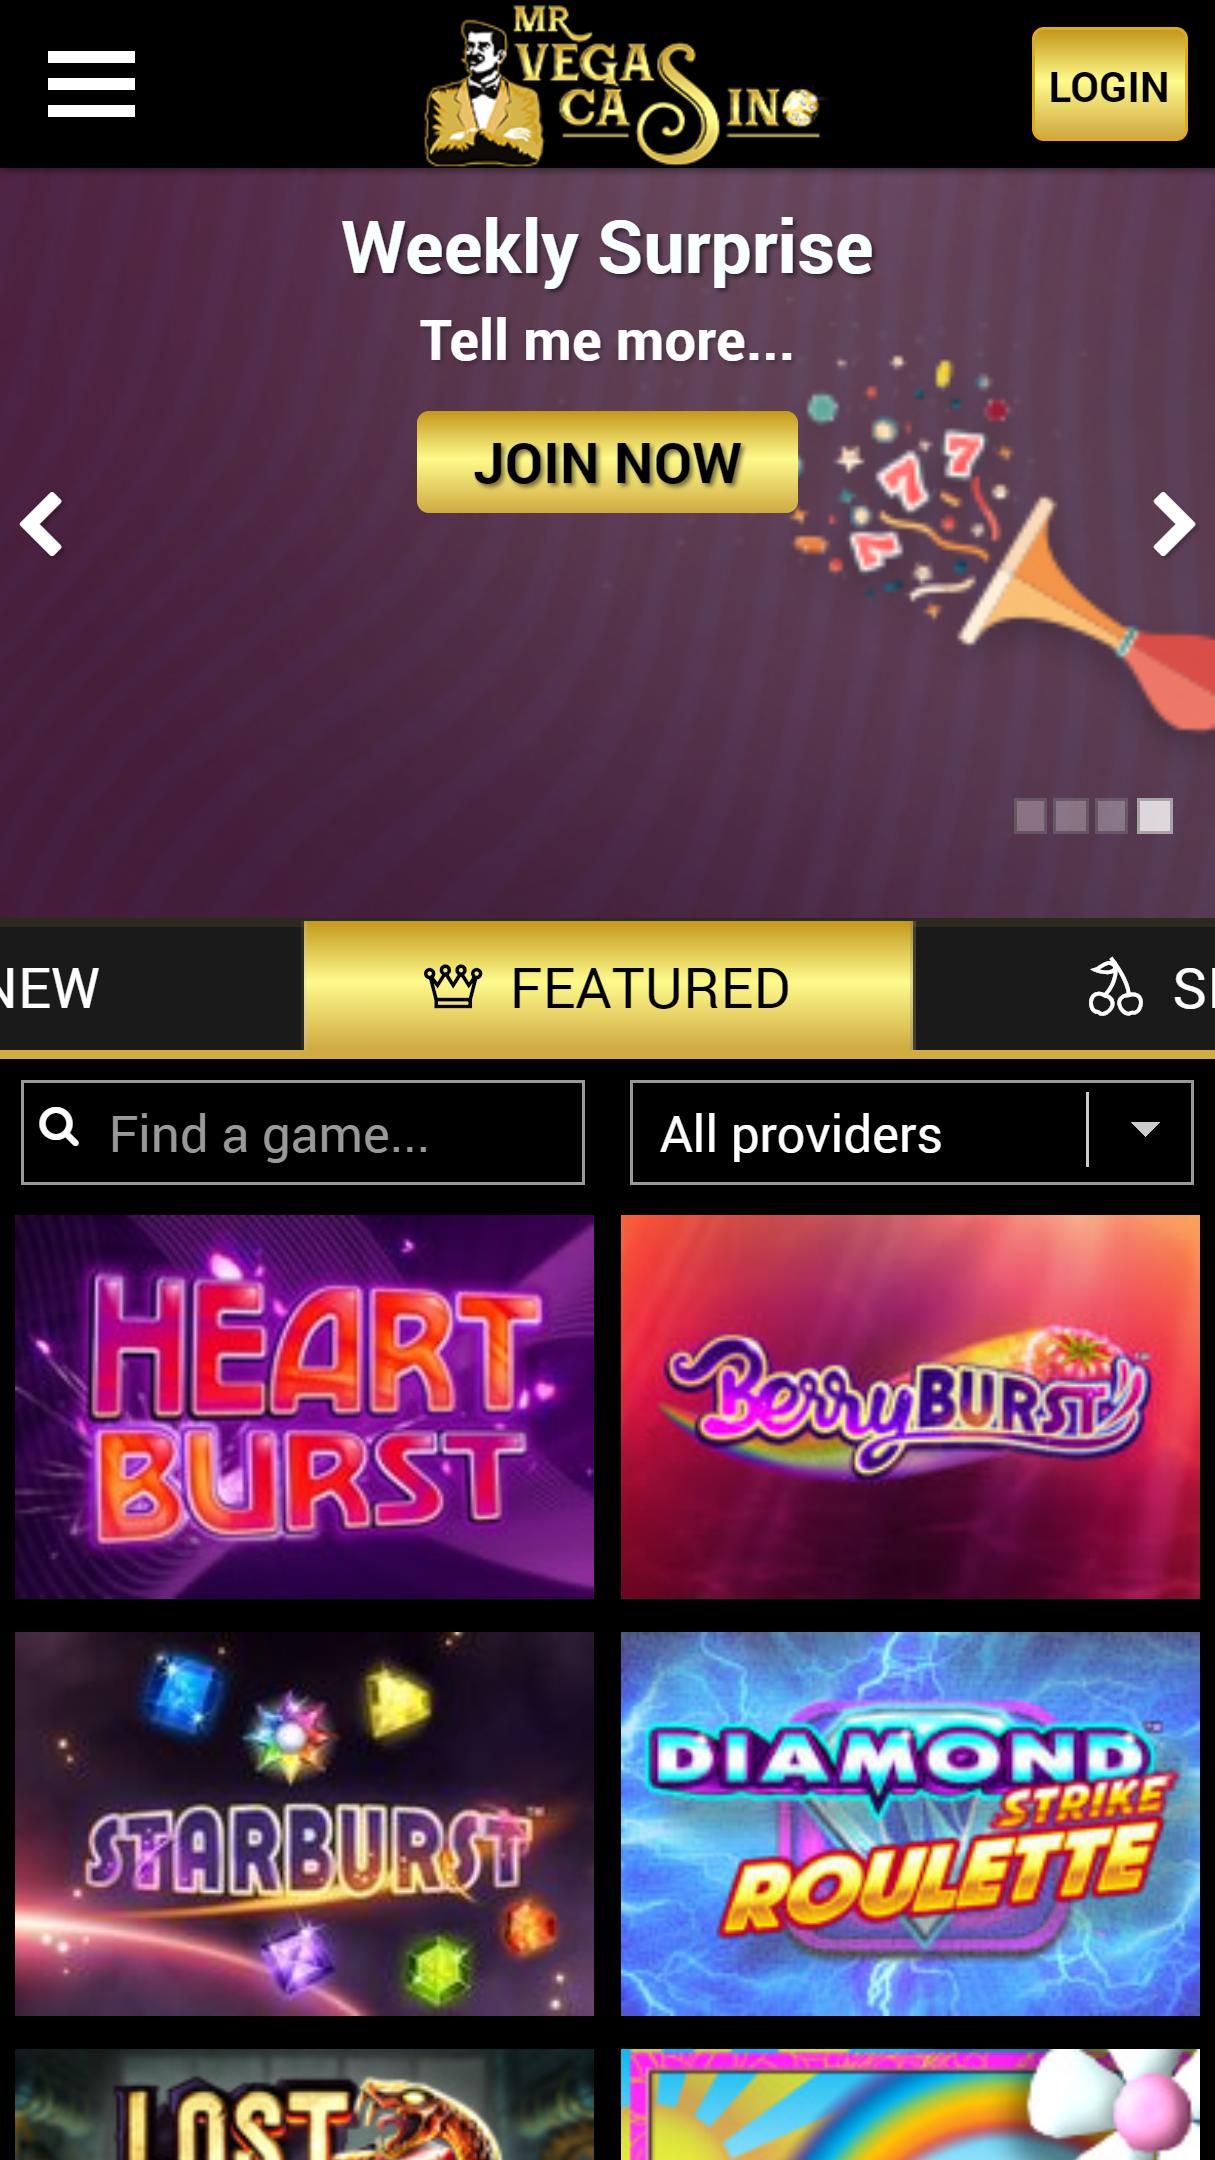 Mr Vegas Casino App Homepage